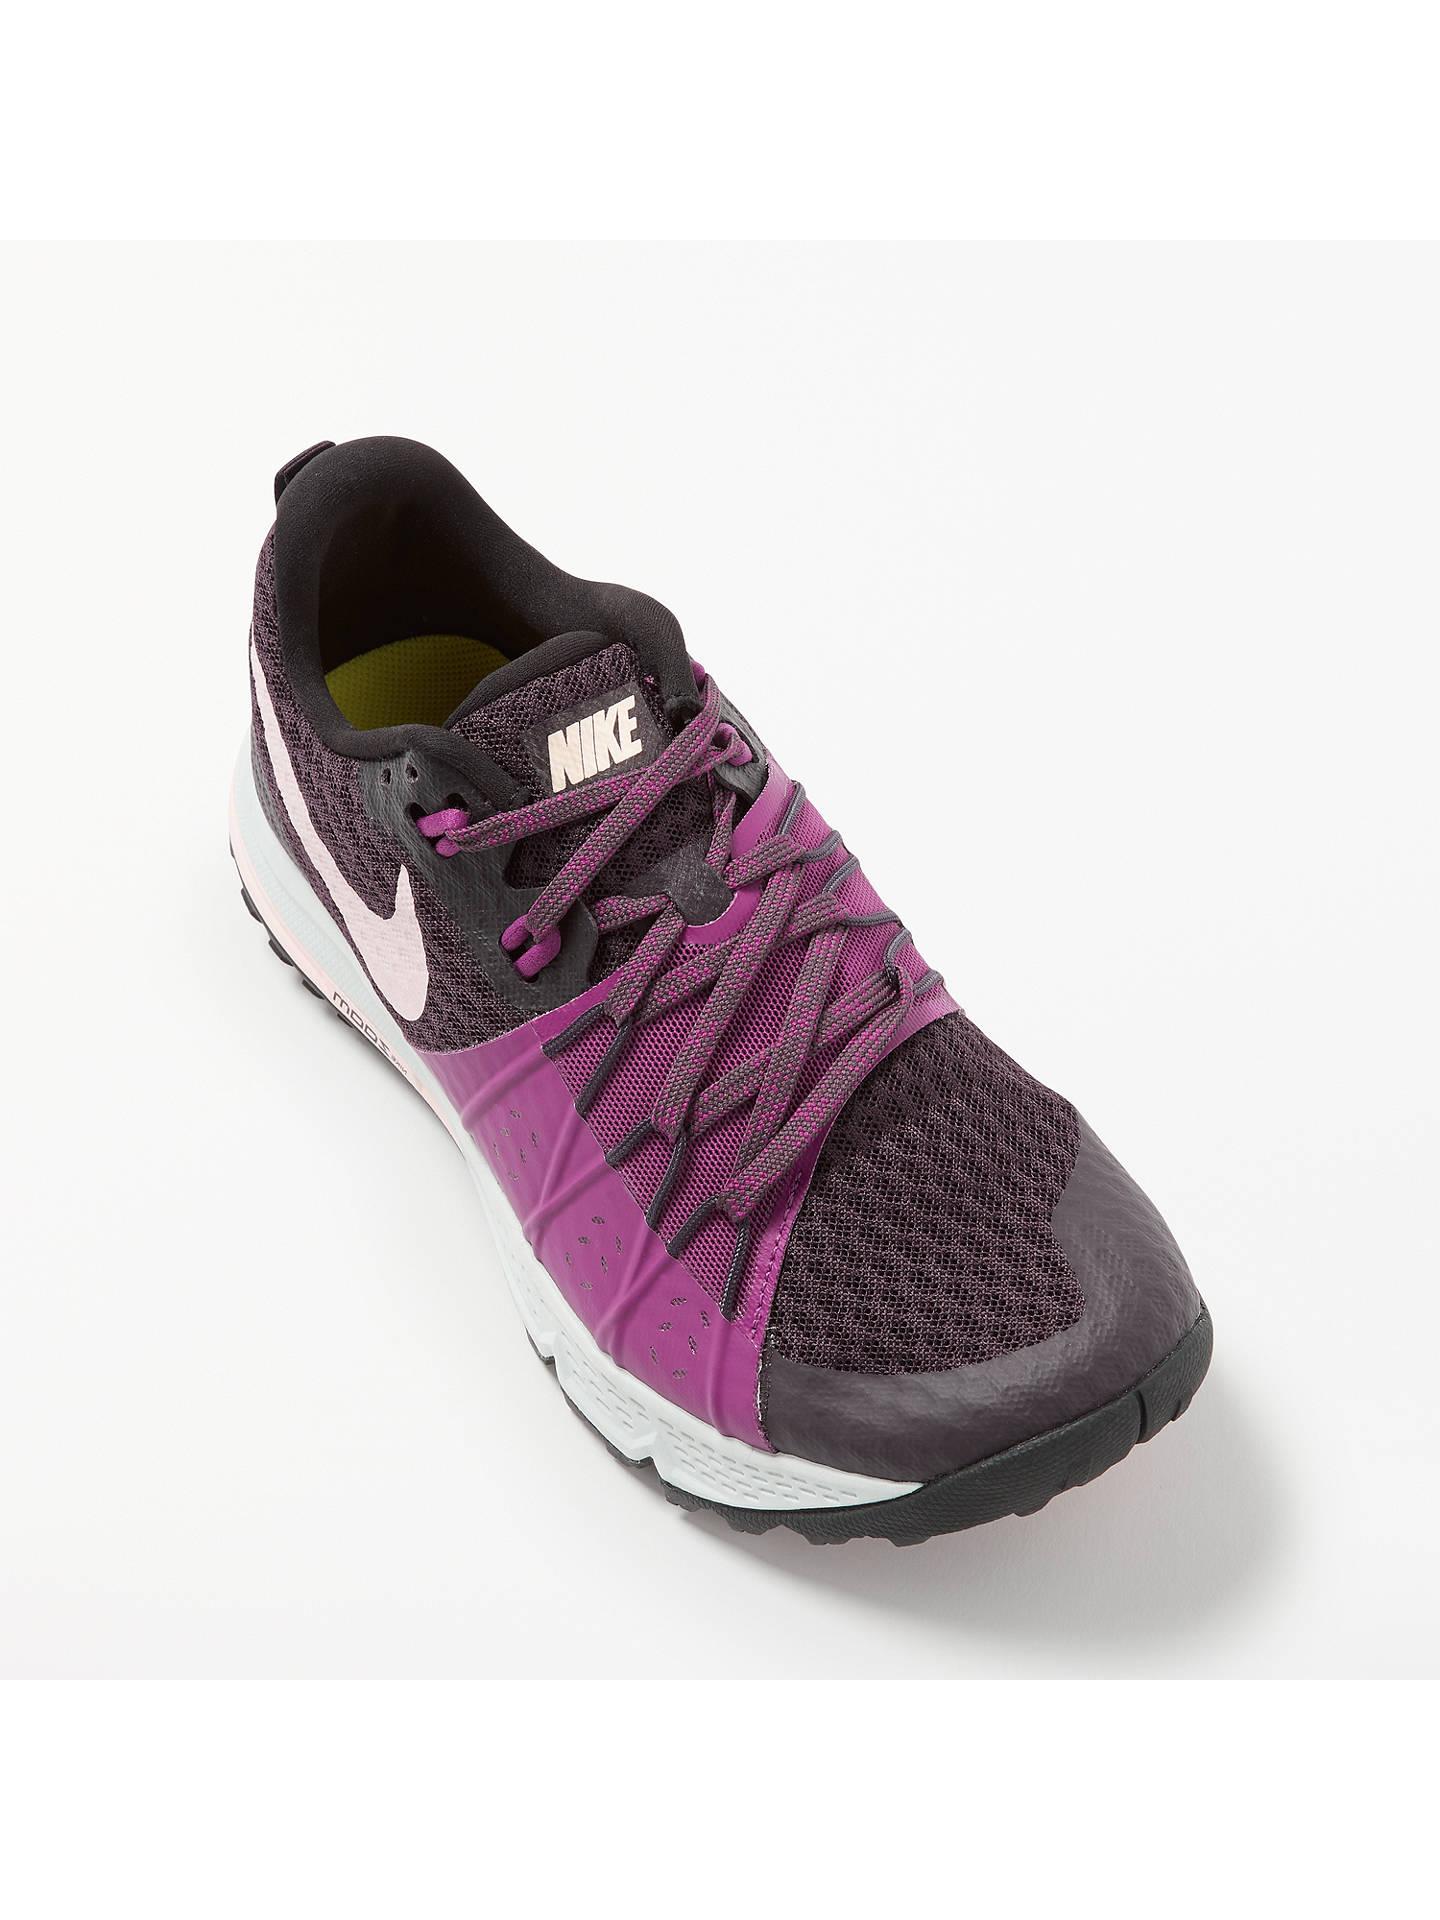 timeless design 63cfb ae88c ... Buy Nike Air Zoom Wildhorse 4 Women s Running Shoes, Port Wine Sunset  Tint- ...